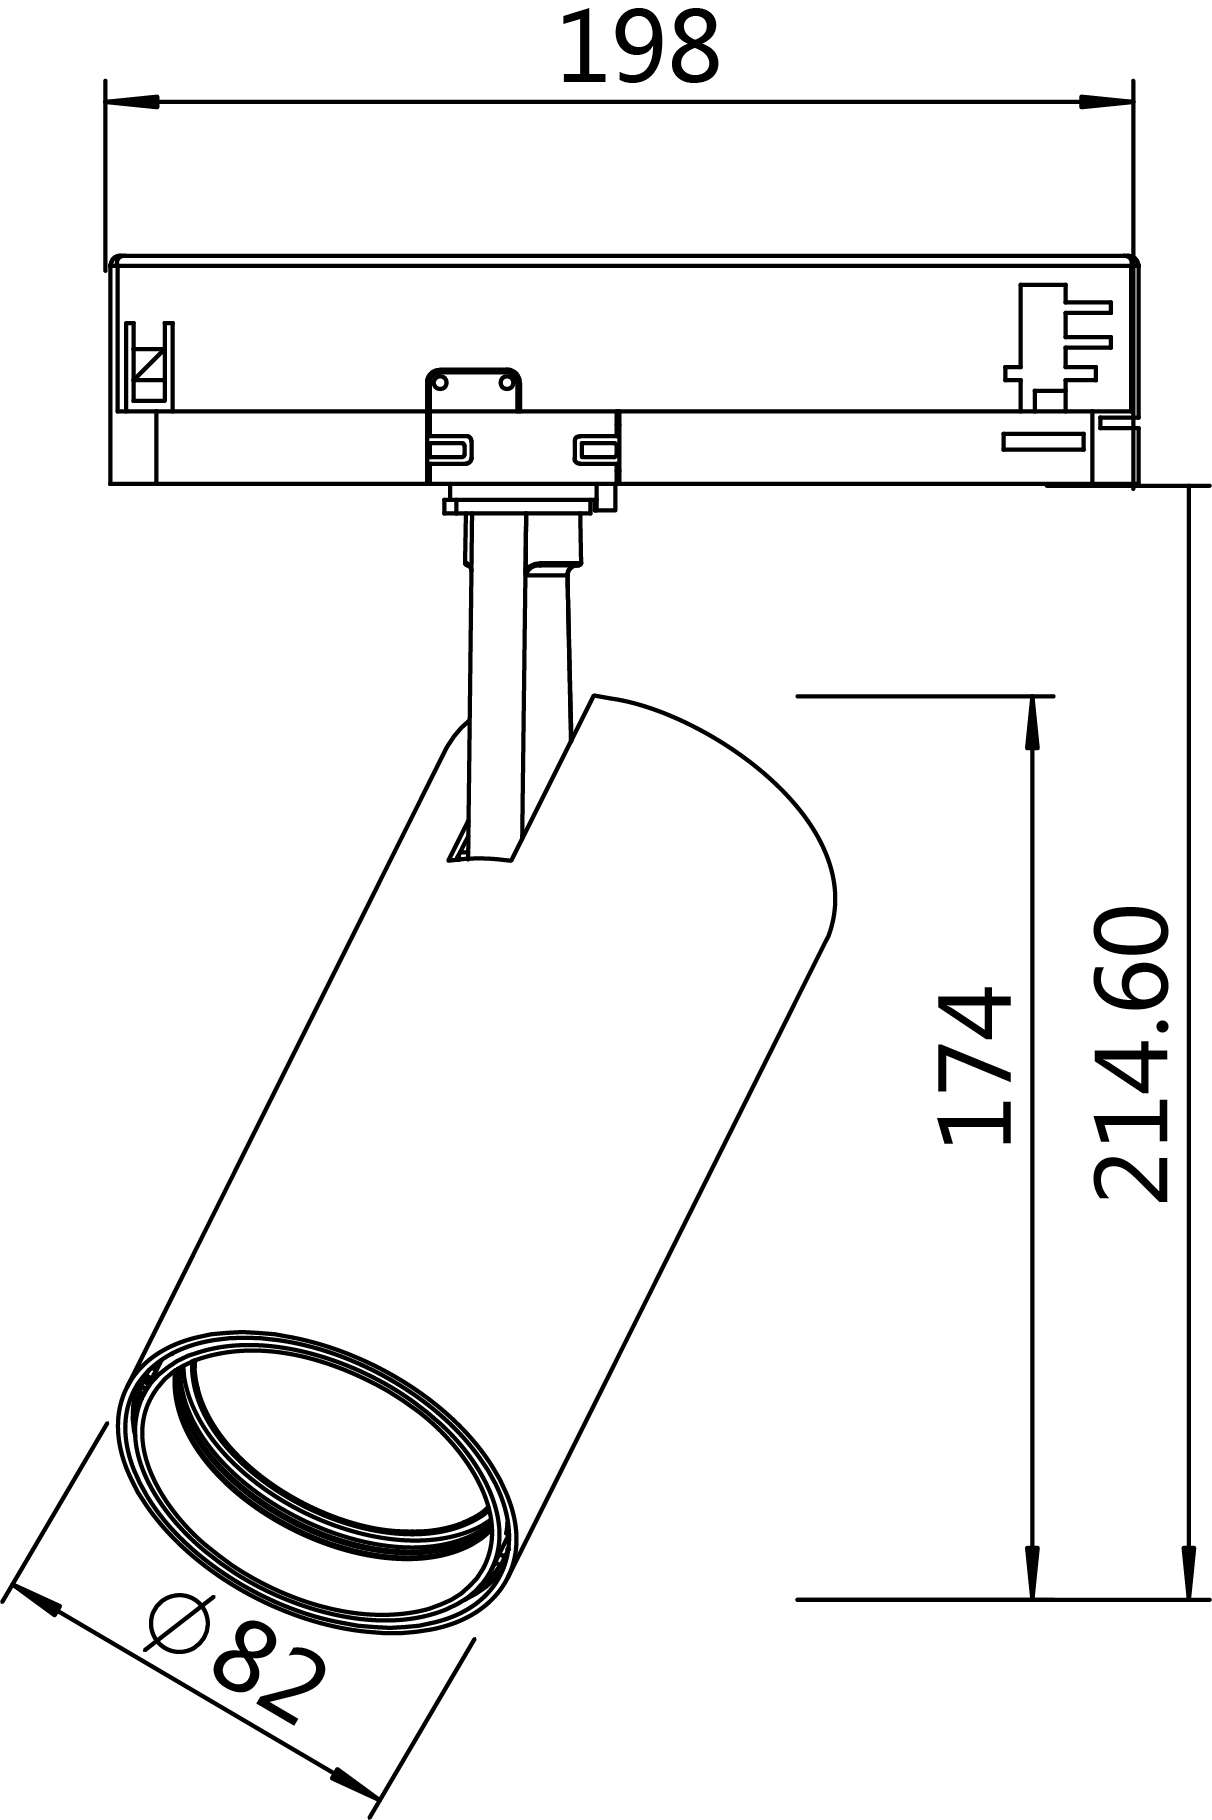 TUBE-2